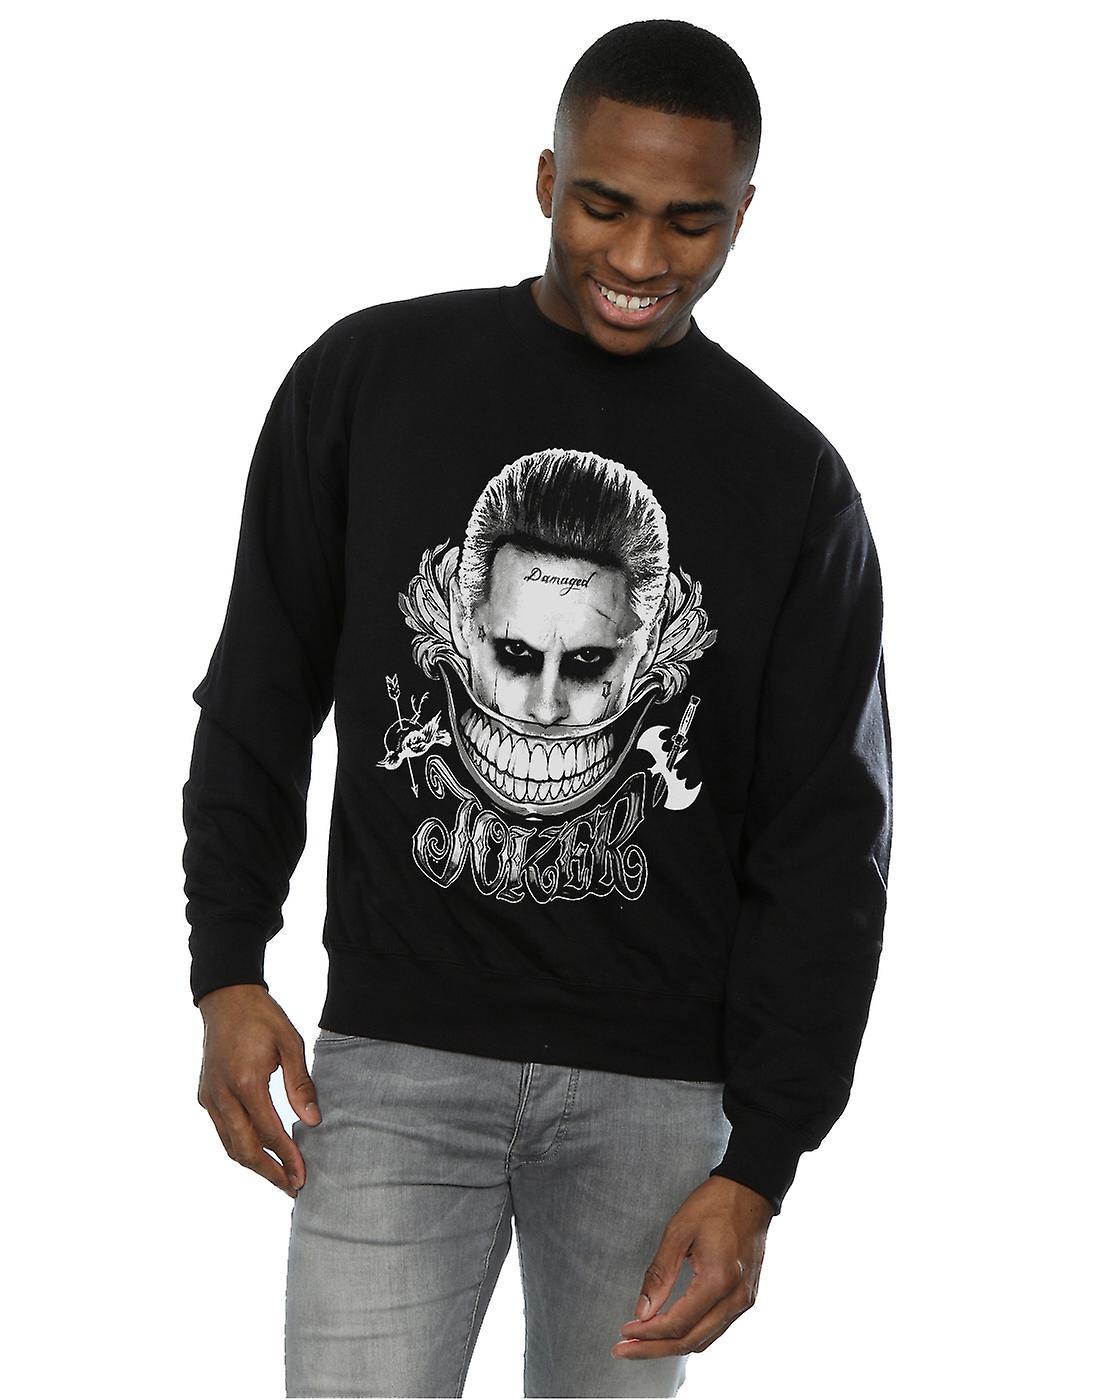 2987e391feb5 Suicide Squad Men s Joker Black And White Smile Sweatshirt